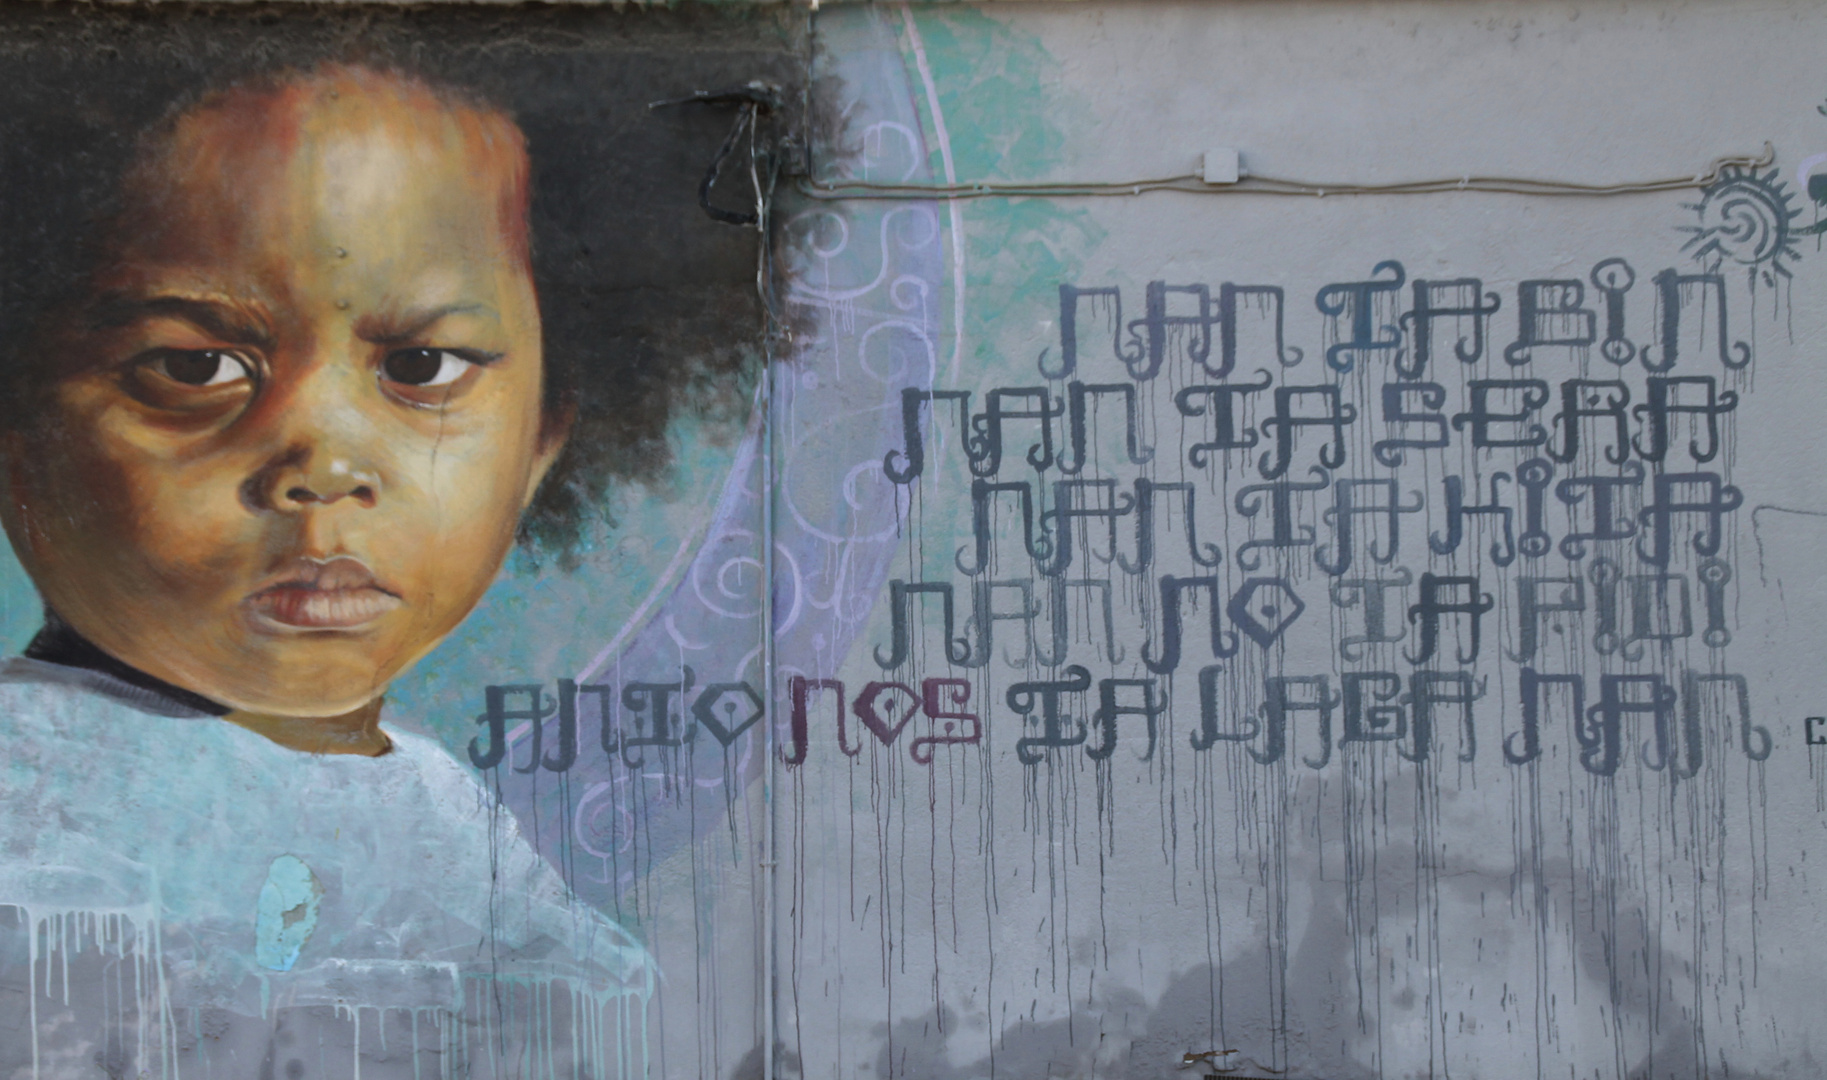 Mural in Curacao